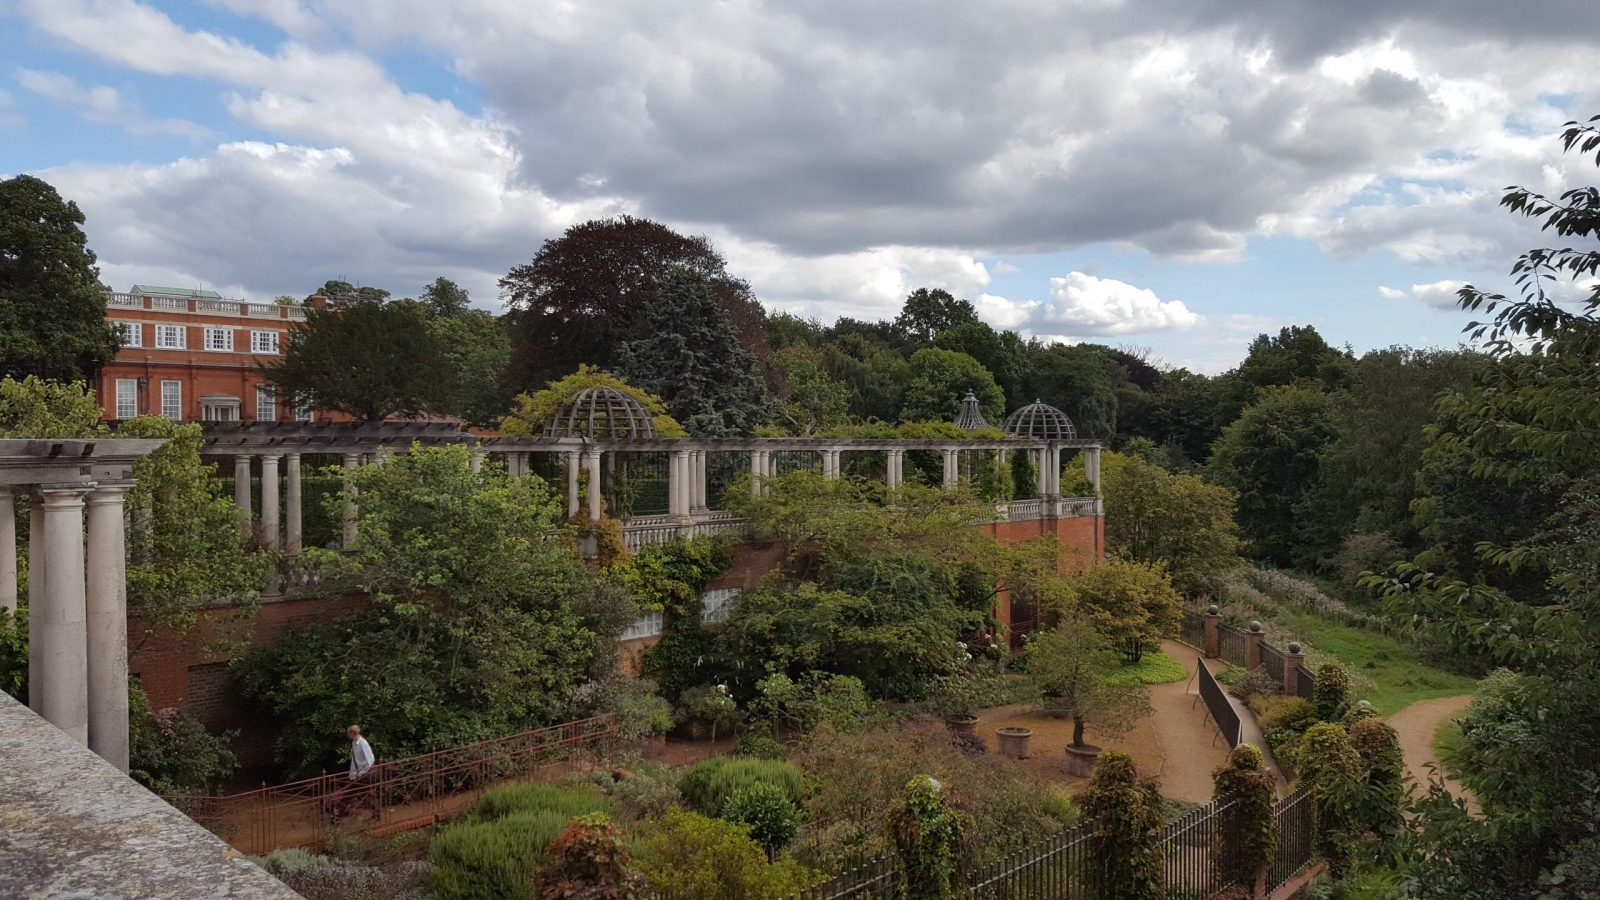 Visiting Hill Garden & Pergola, Hampstead Heath: Photo Gallery 5